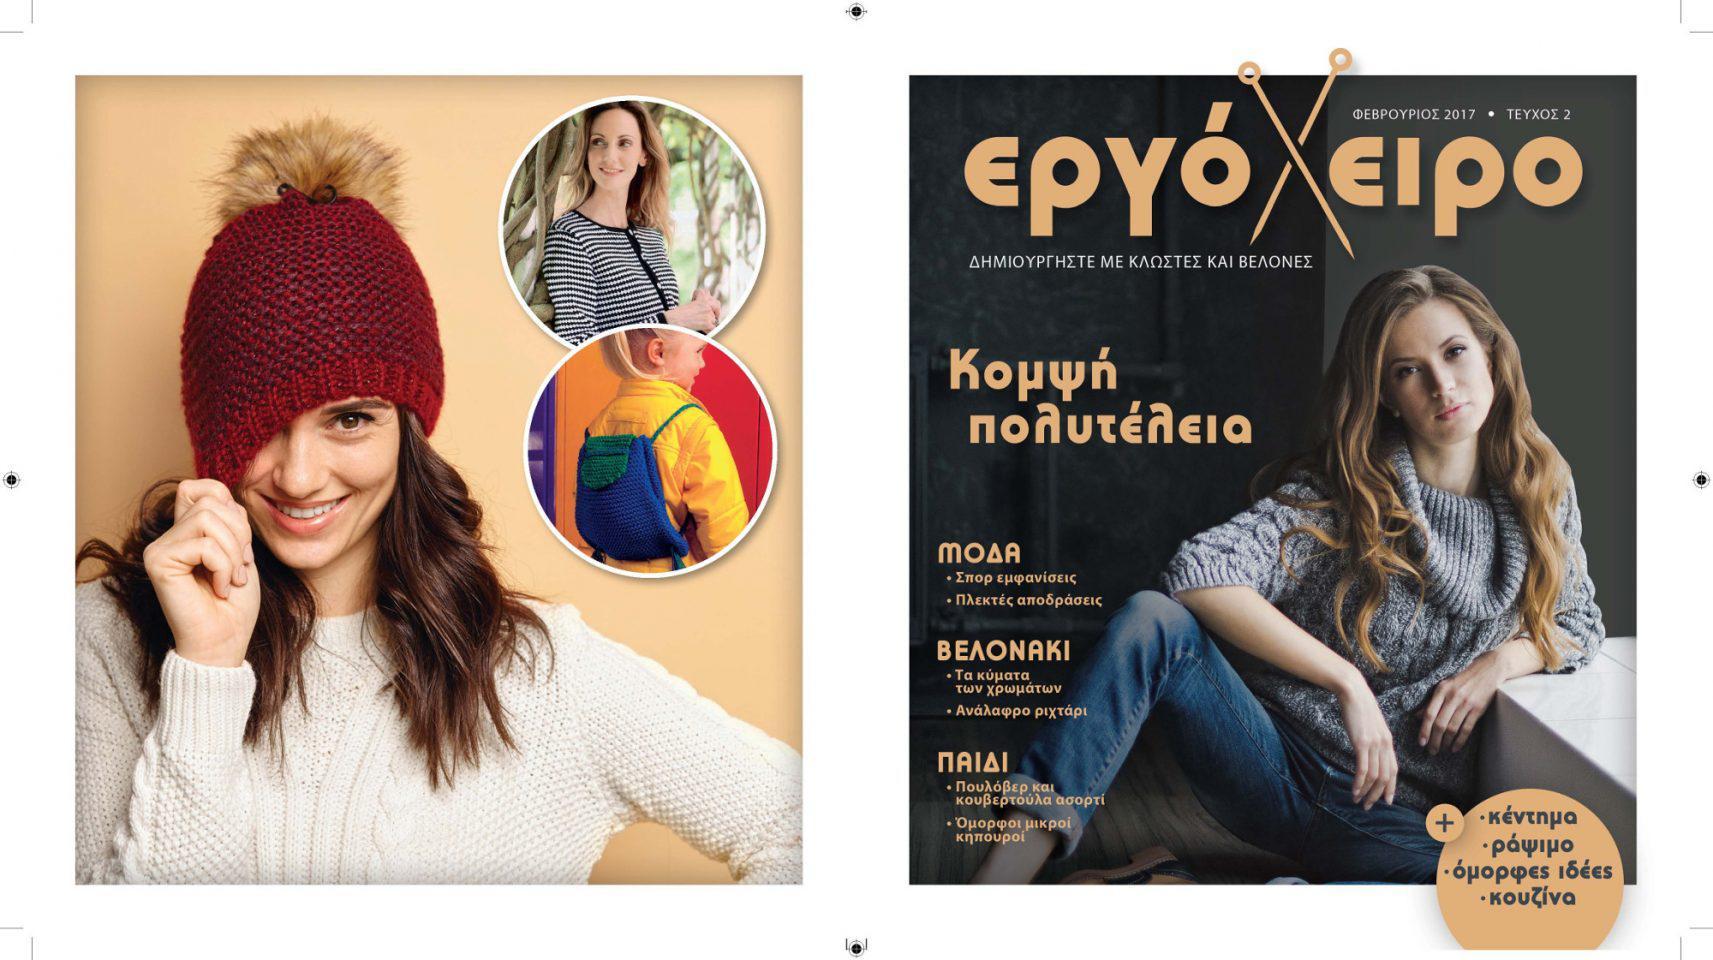 ergoxeiro2-cover Μην χάσετε τον Ελεύθερο Τύπο της Κυριακής, 12 Φεβρουαρίου, με 4 μοναδικές προσφορές